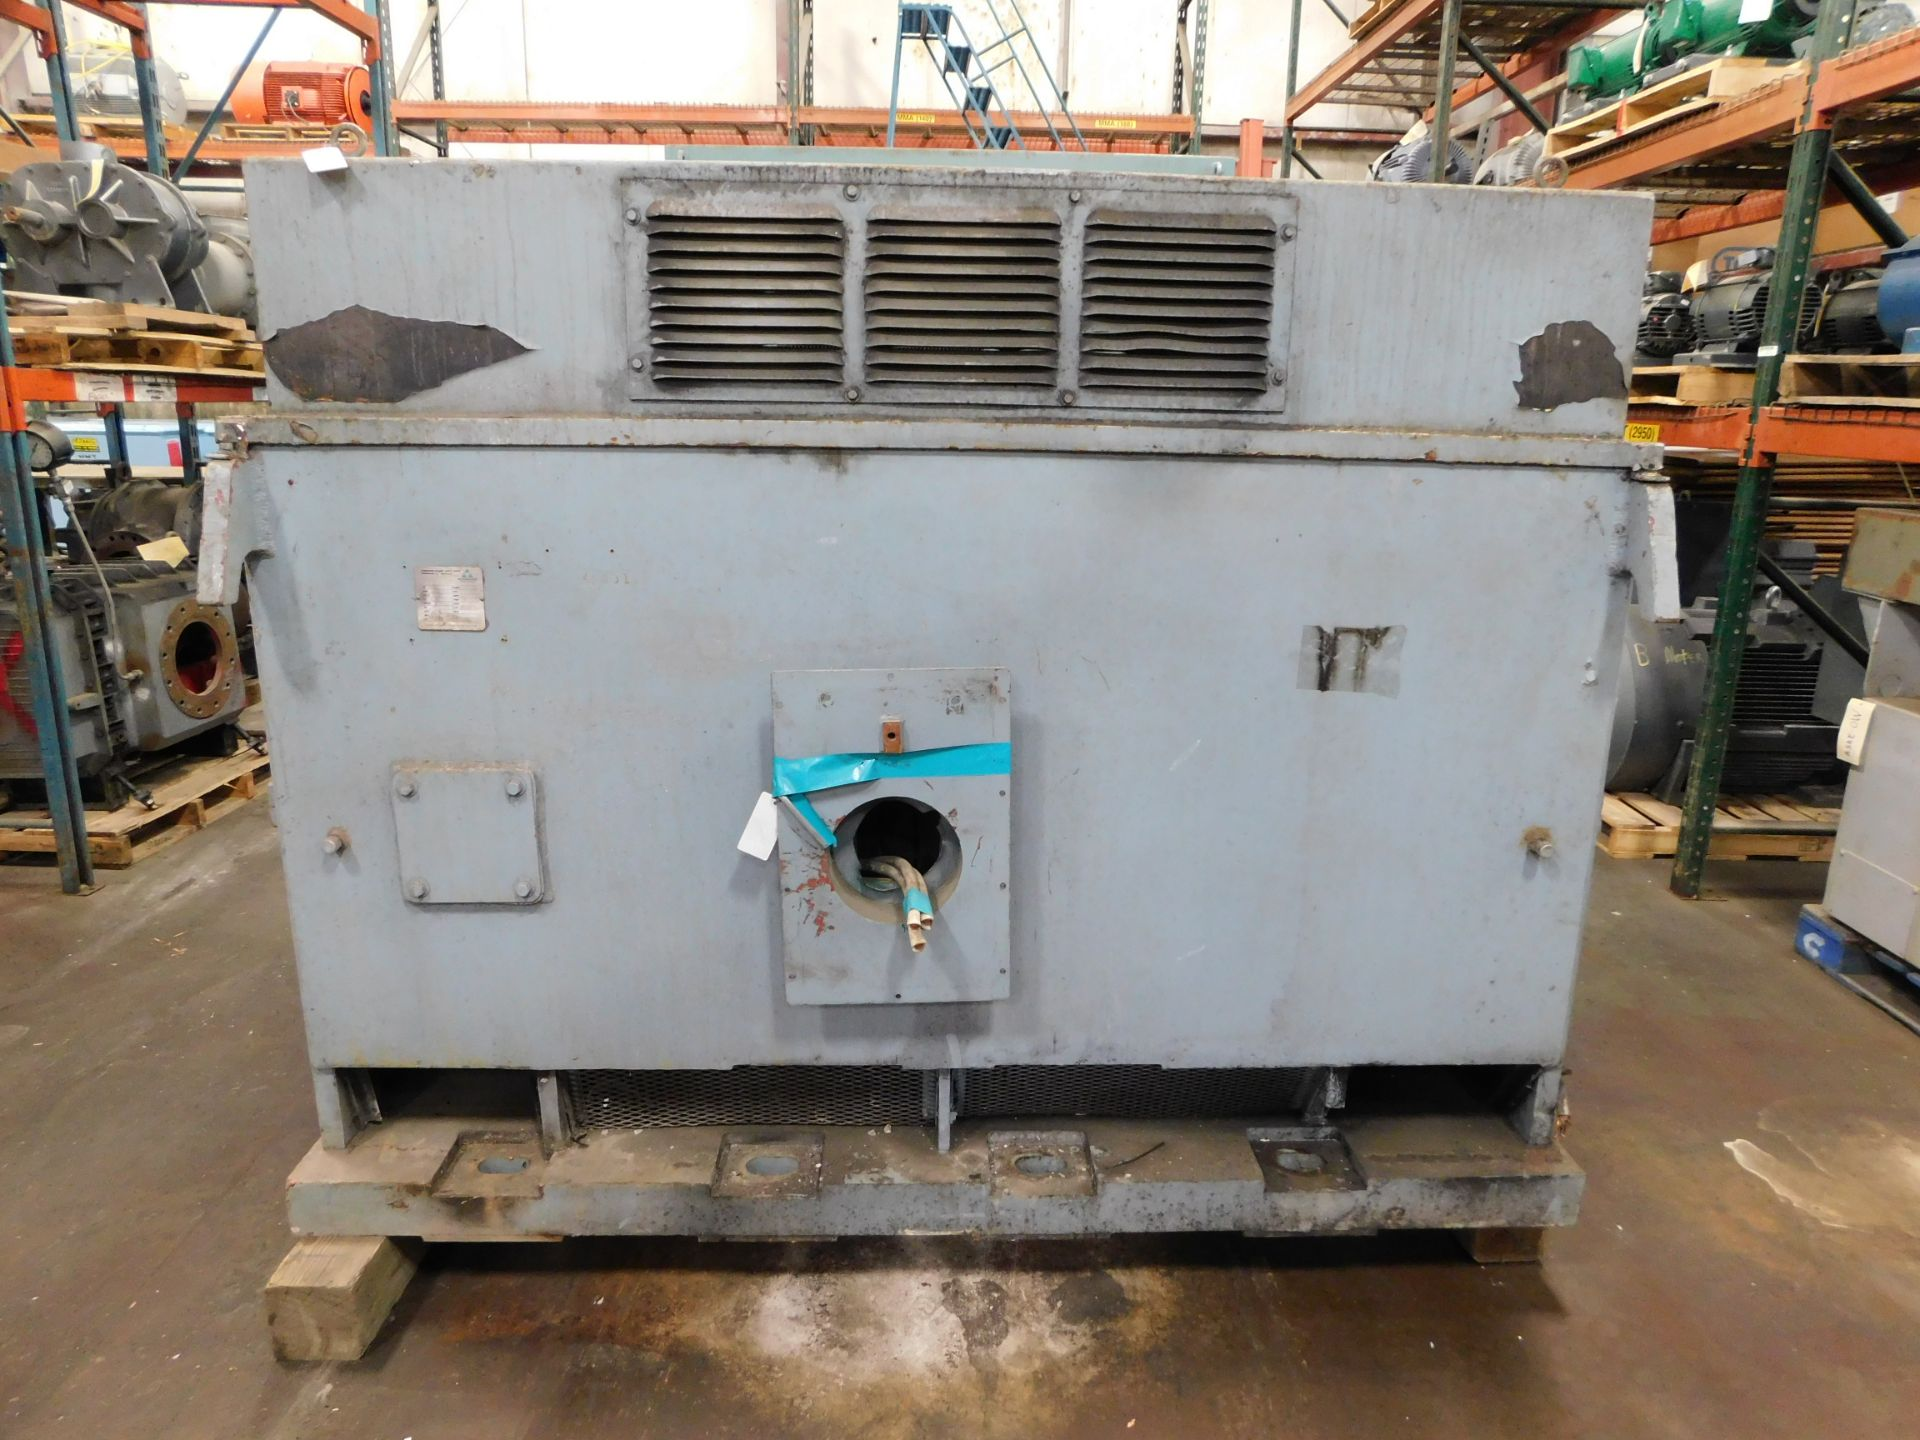 Louis Allis IPS Induction Motor. 2500 HP. 3 Ph. 4000 V. 3590 RPM. WP-1. 1000 SPC. - Image 4 of 5